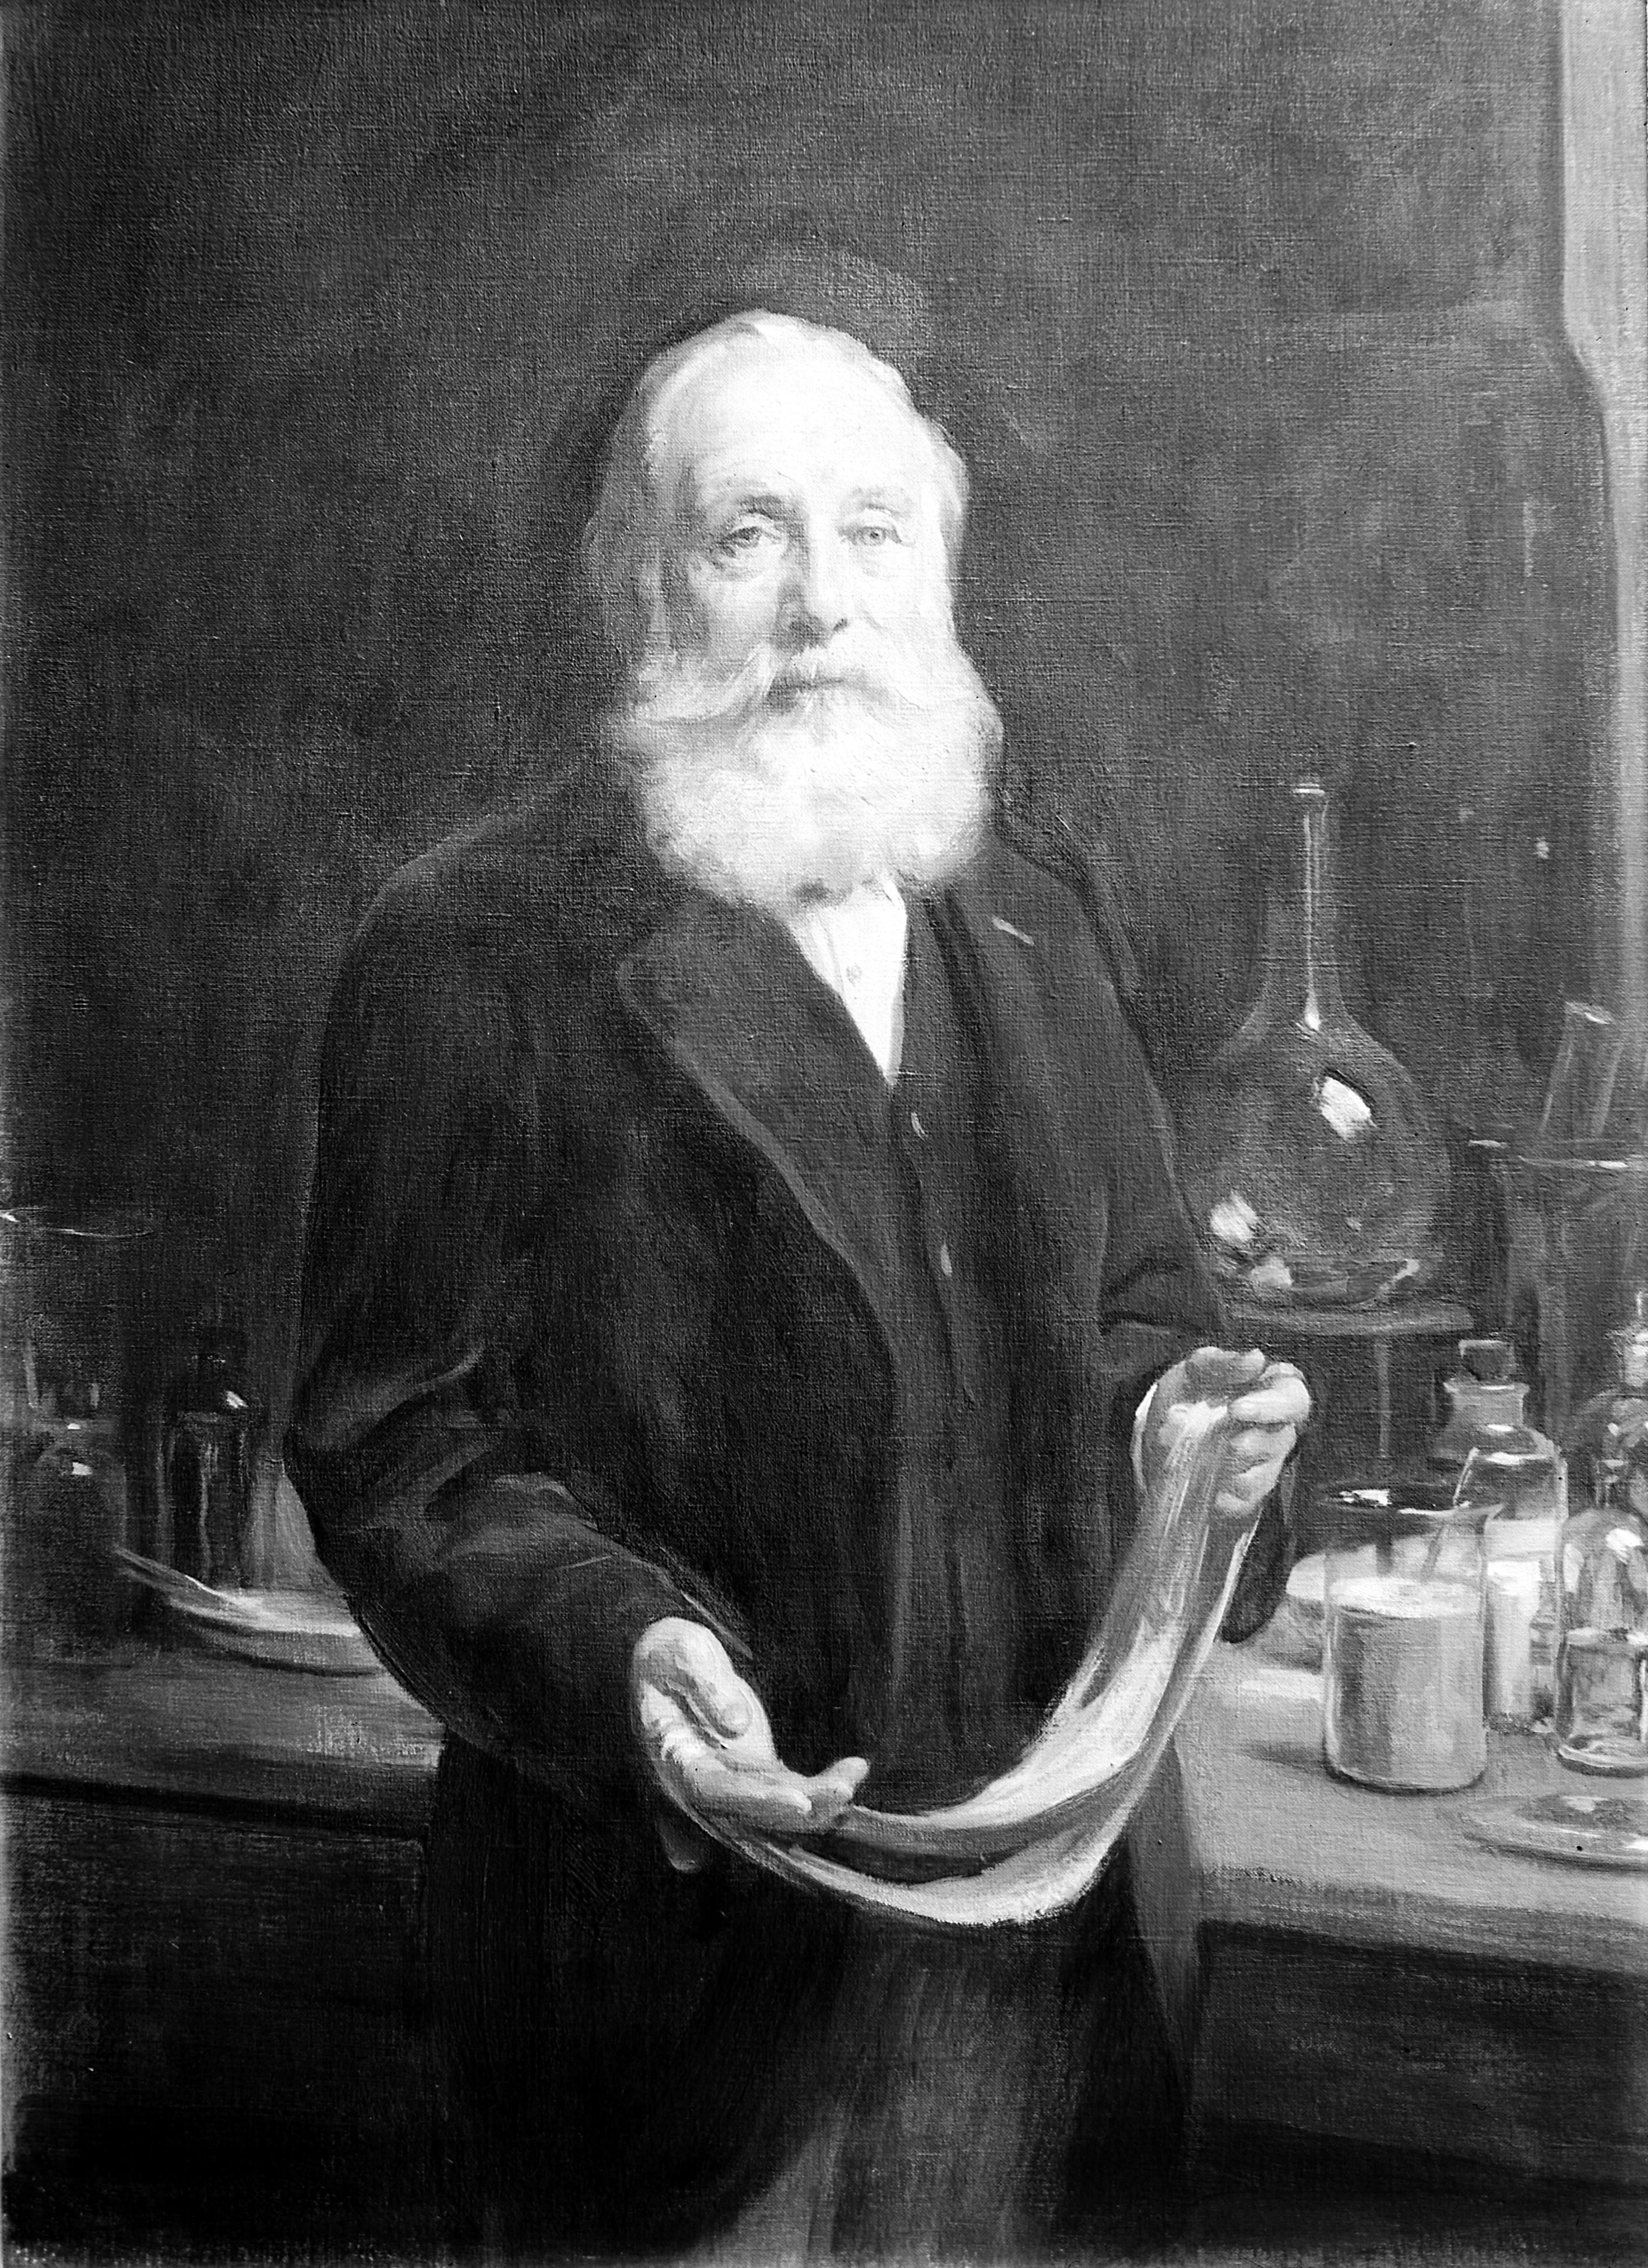 Fileportrait Of Sir William Henry Perkin   Chemist Wellcome